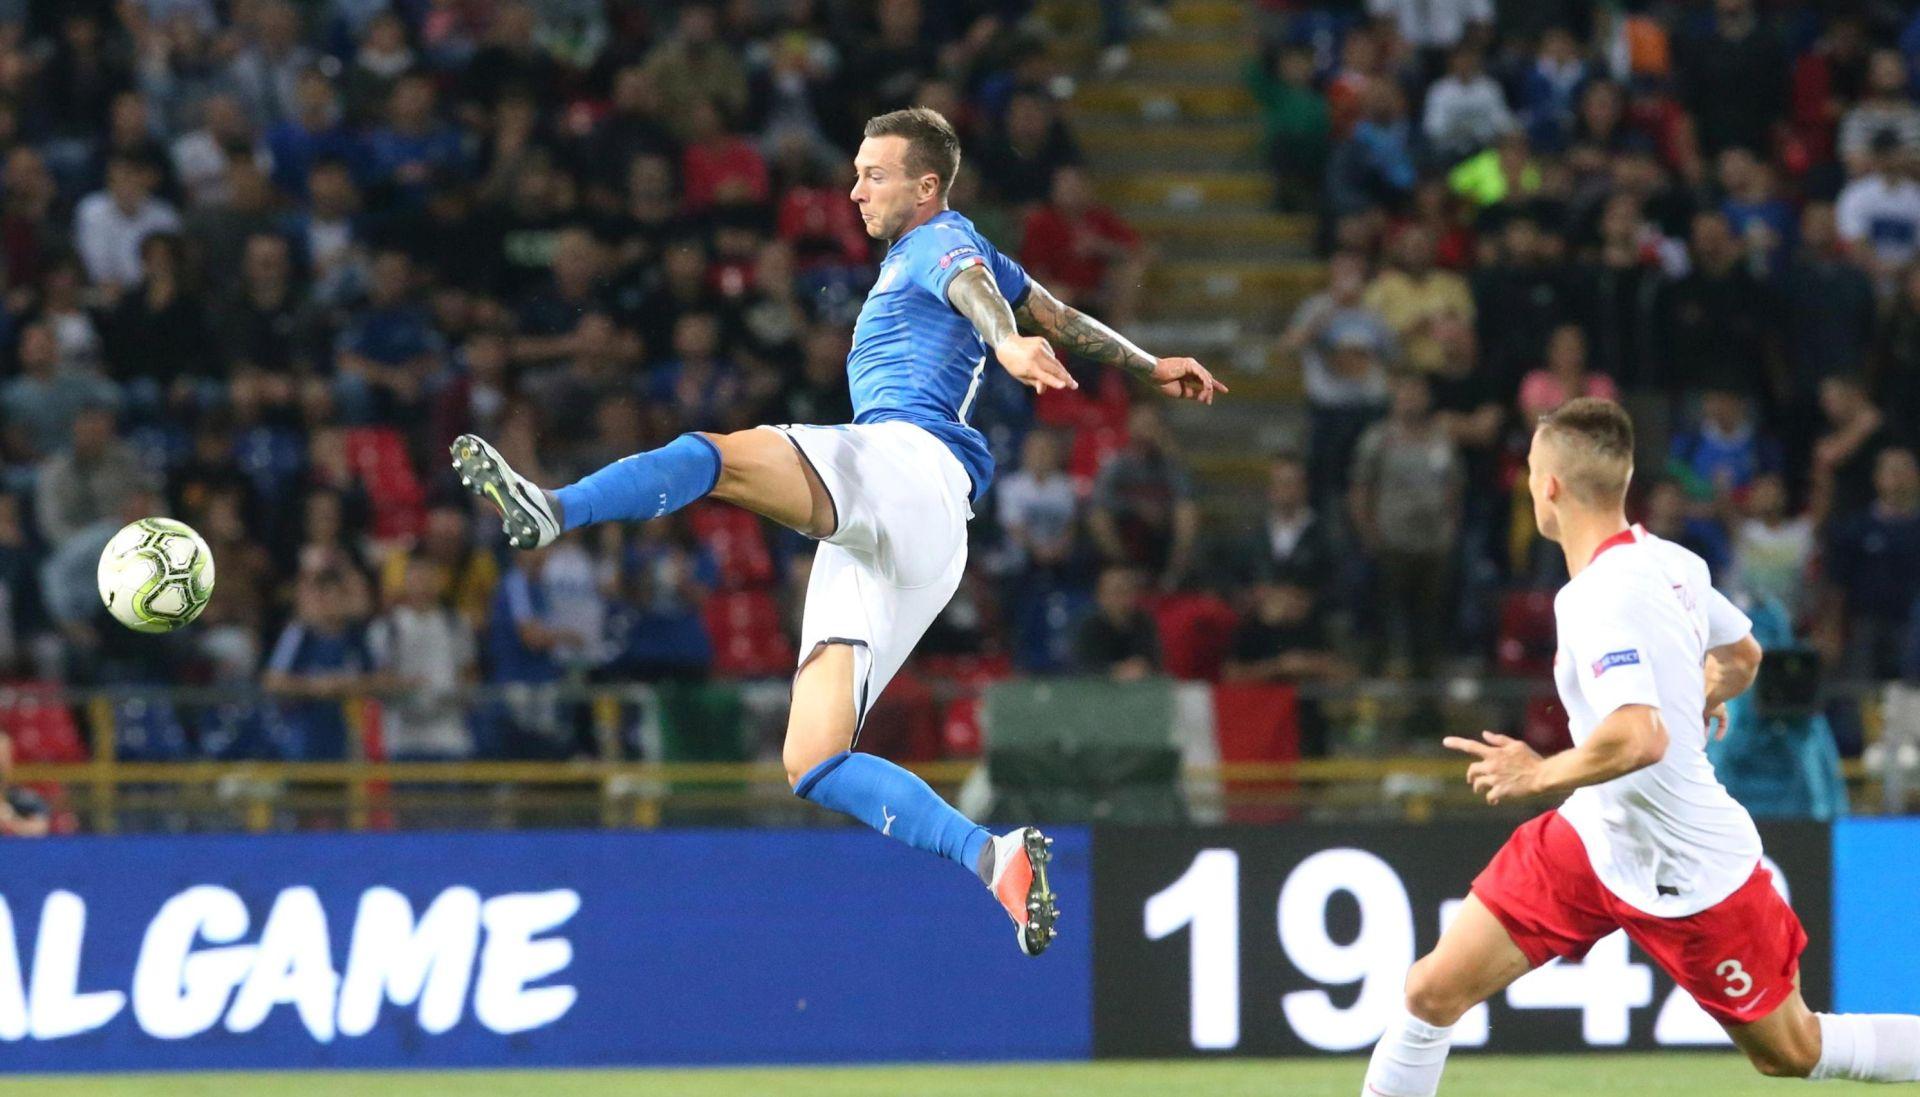 Remi Talijana u Bologni, Rusi pobijedili u Istanbulu